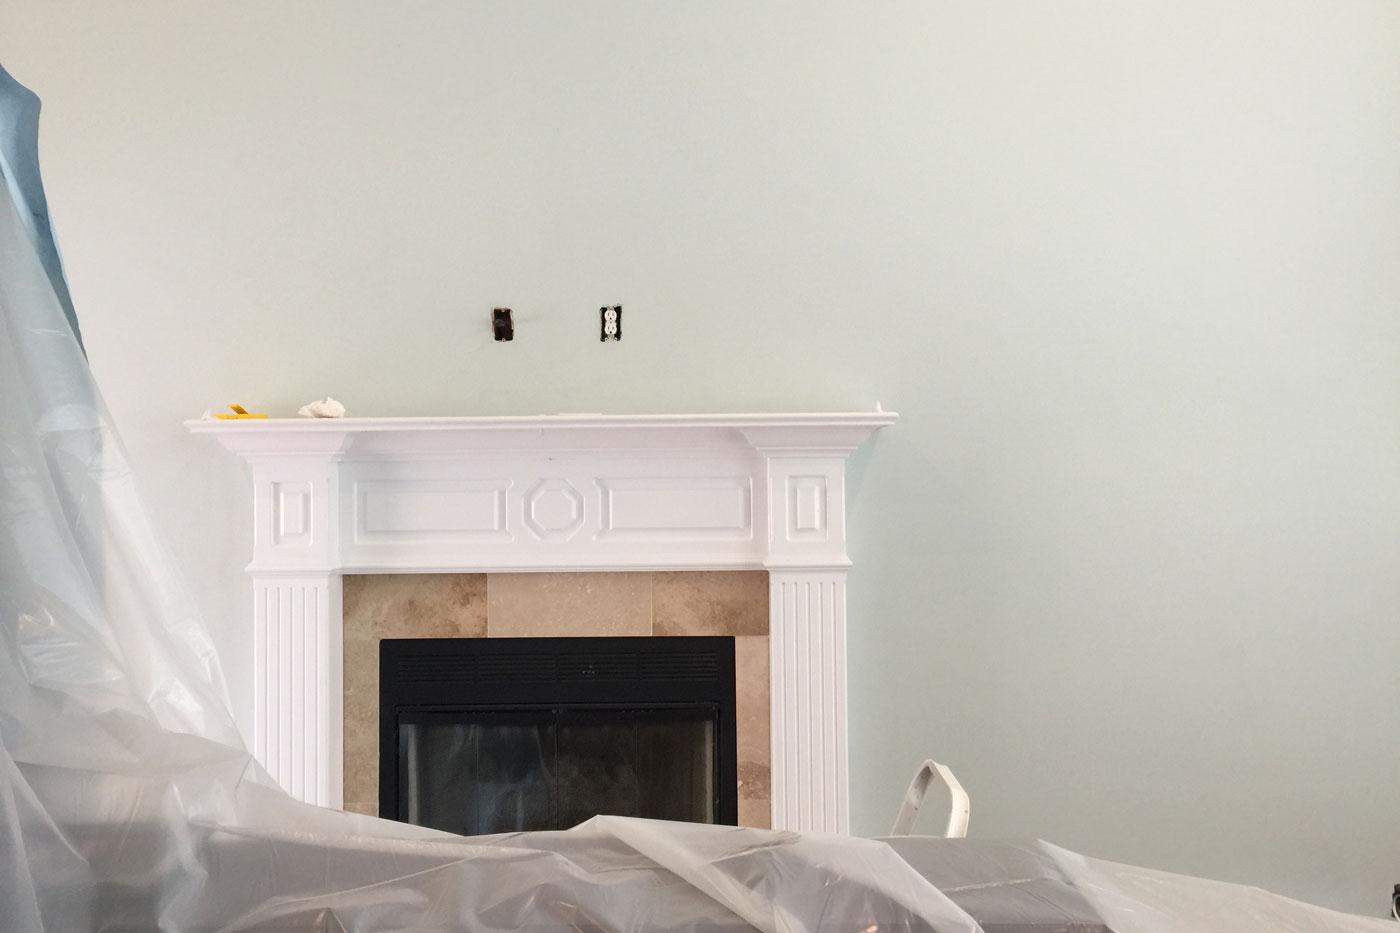 Behr Paint And Primer Vs Aura Exterior